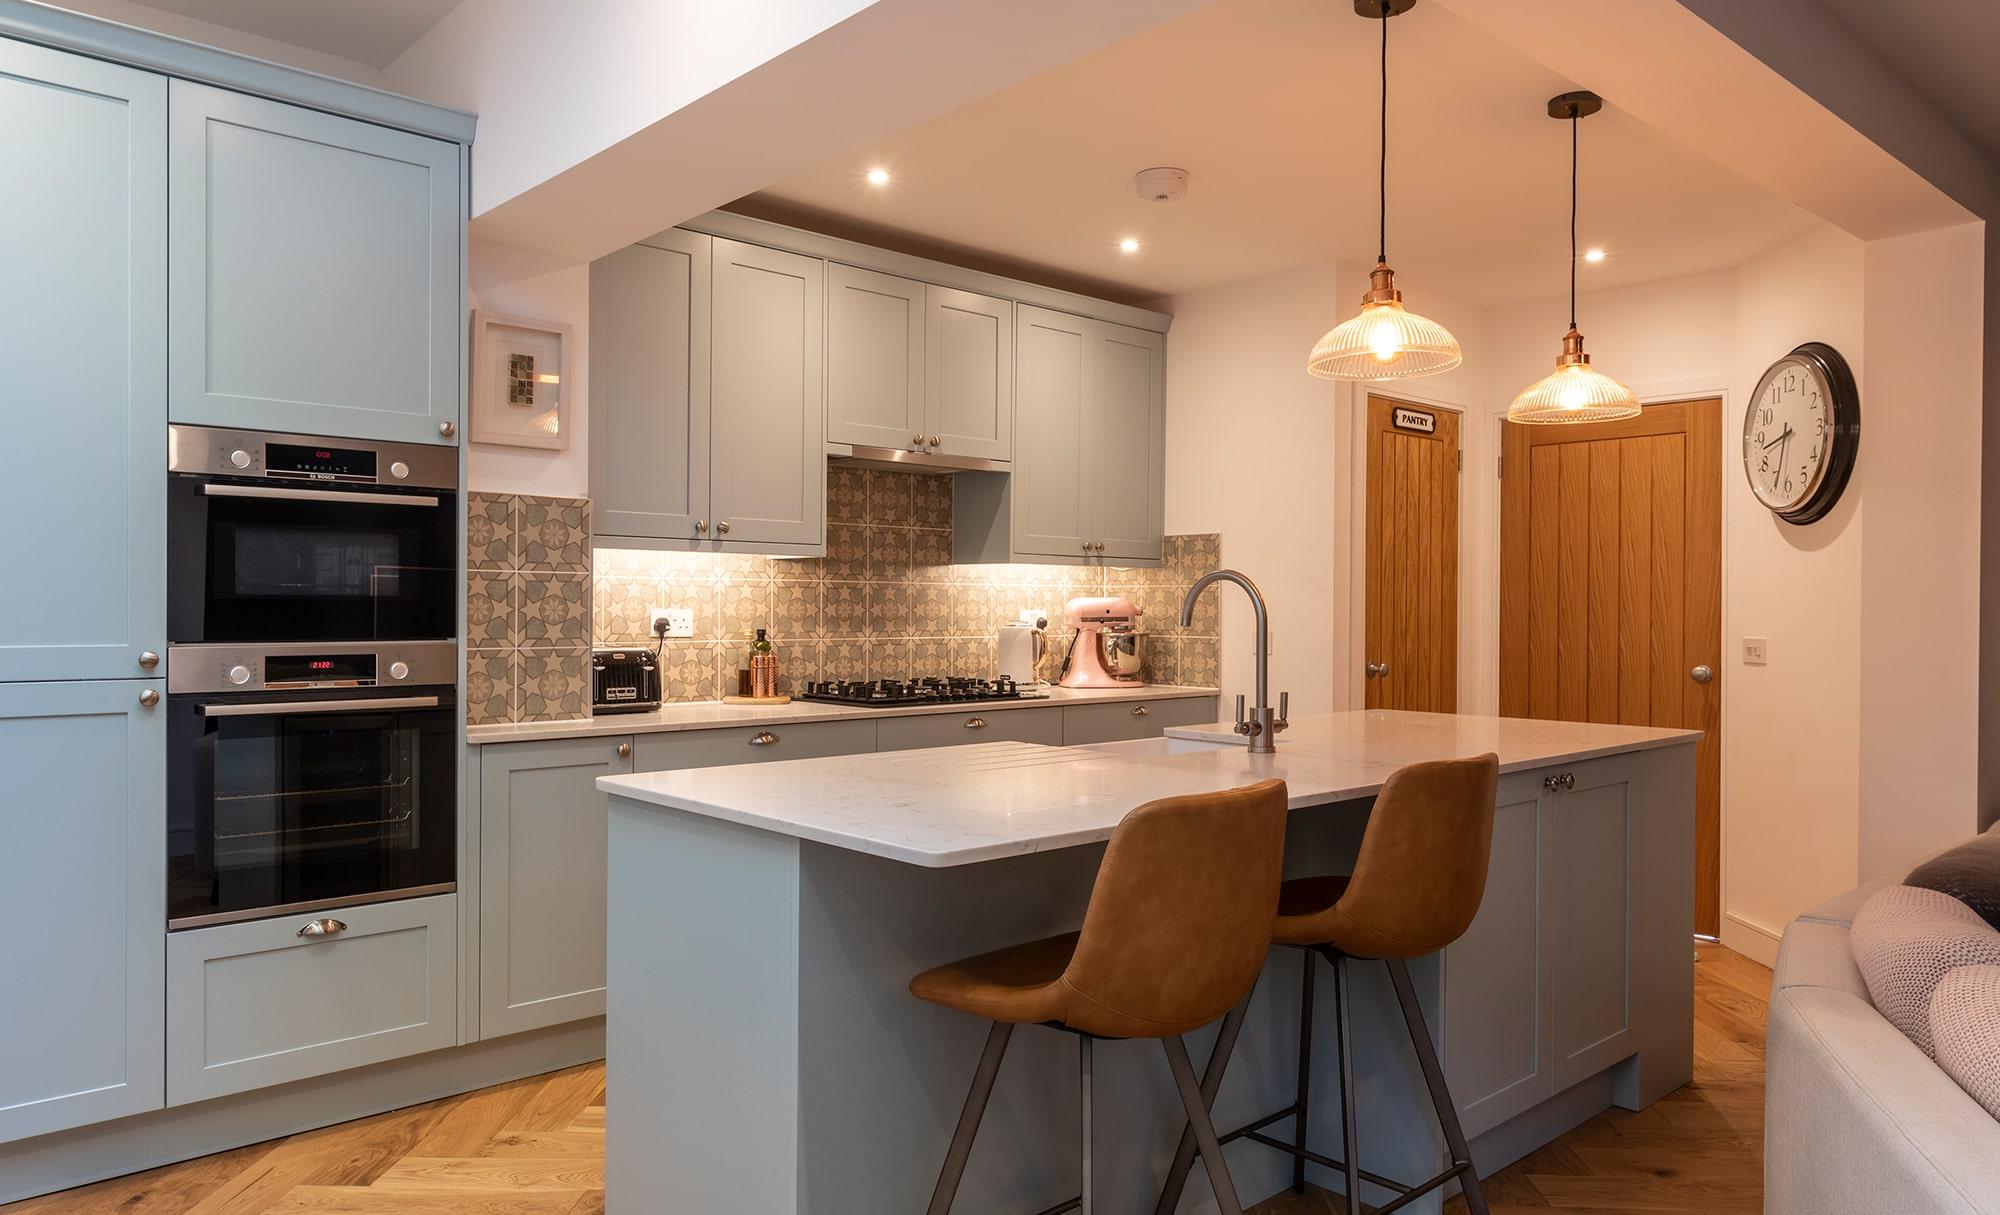 Aldana Shaker Kitchen for a home in Portishead by Portishead Kitchens Hero